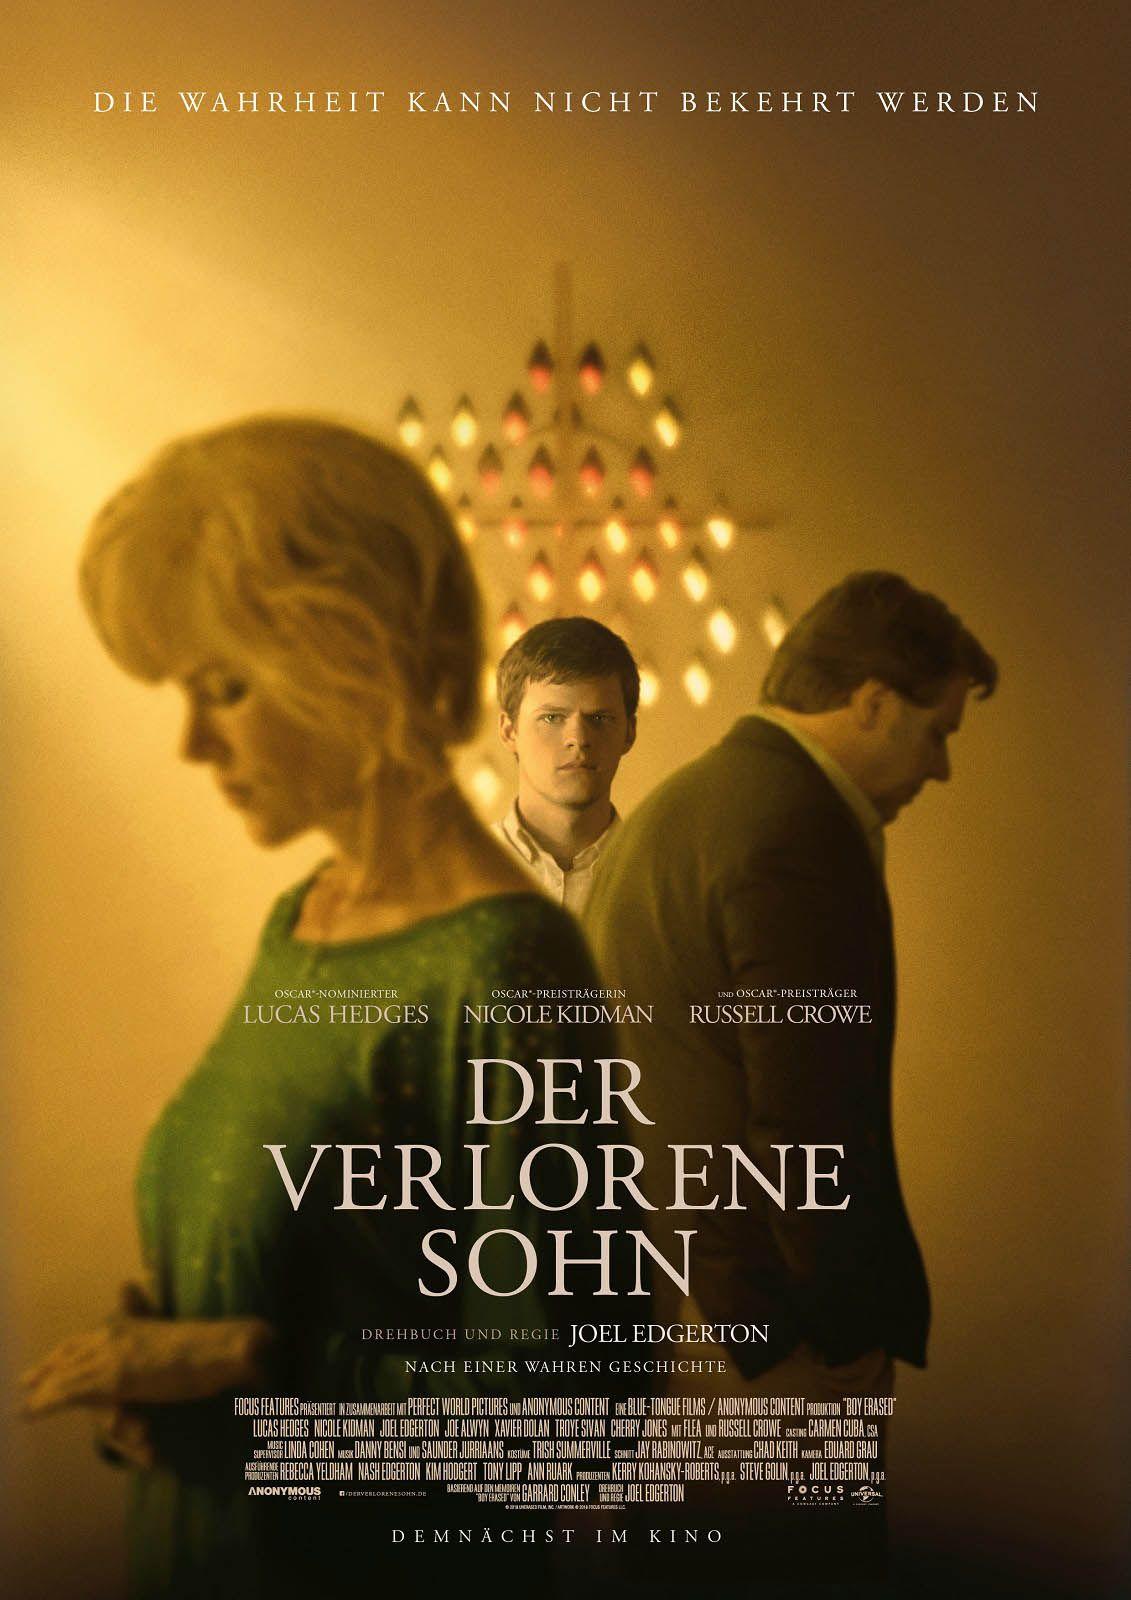 Der Verlorene Sohn Film 2018 Filmstarts De Verlorener Sohn Filme Stream Filme